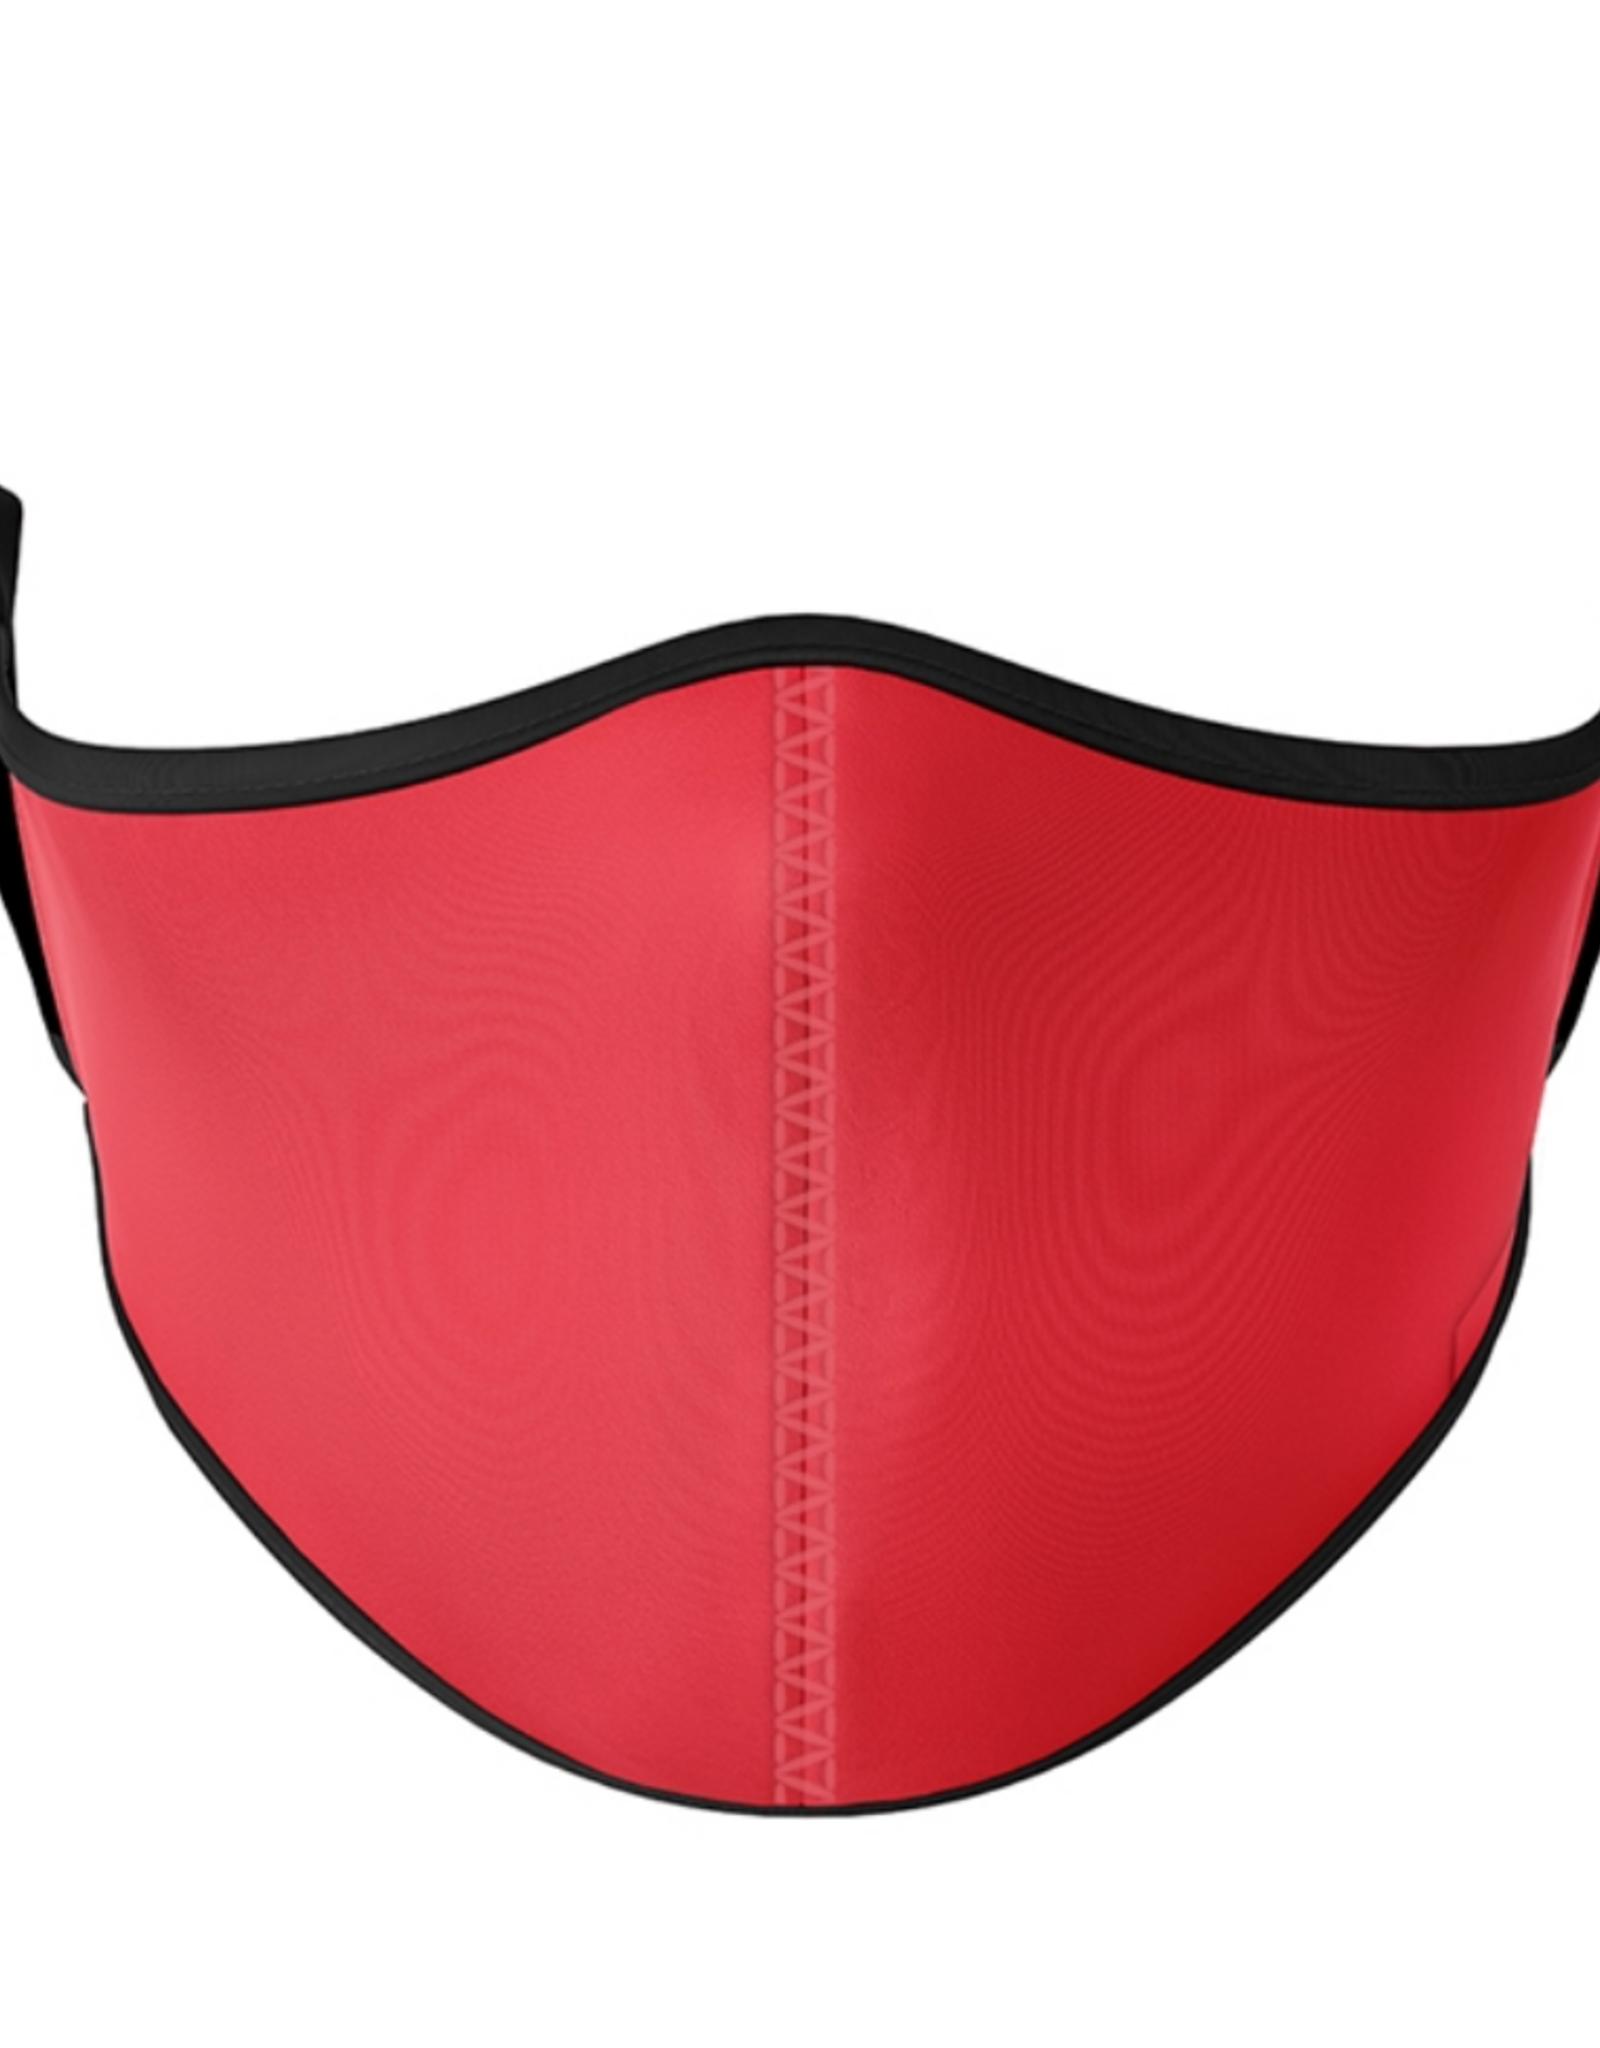 Top Trenz Top Trenz - Medium Size - Solid Red Mask